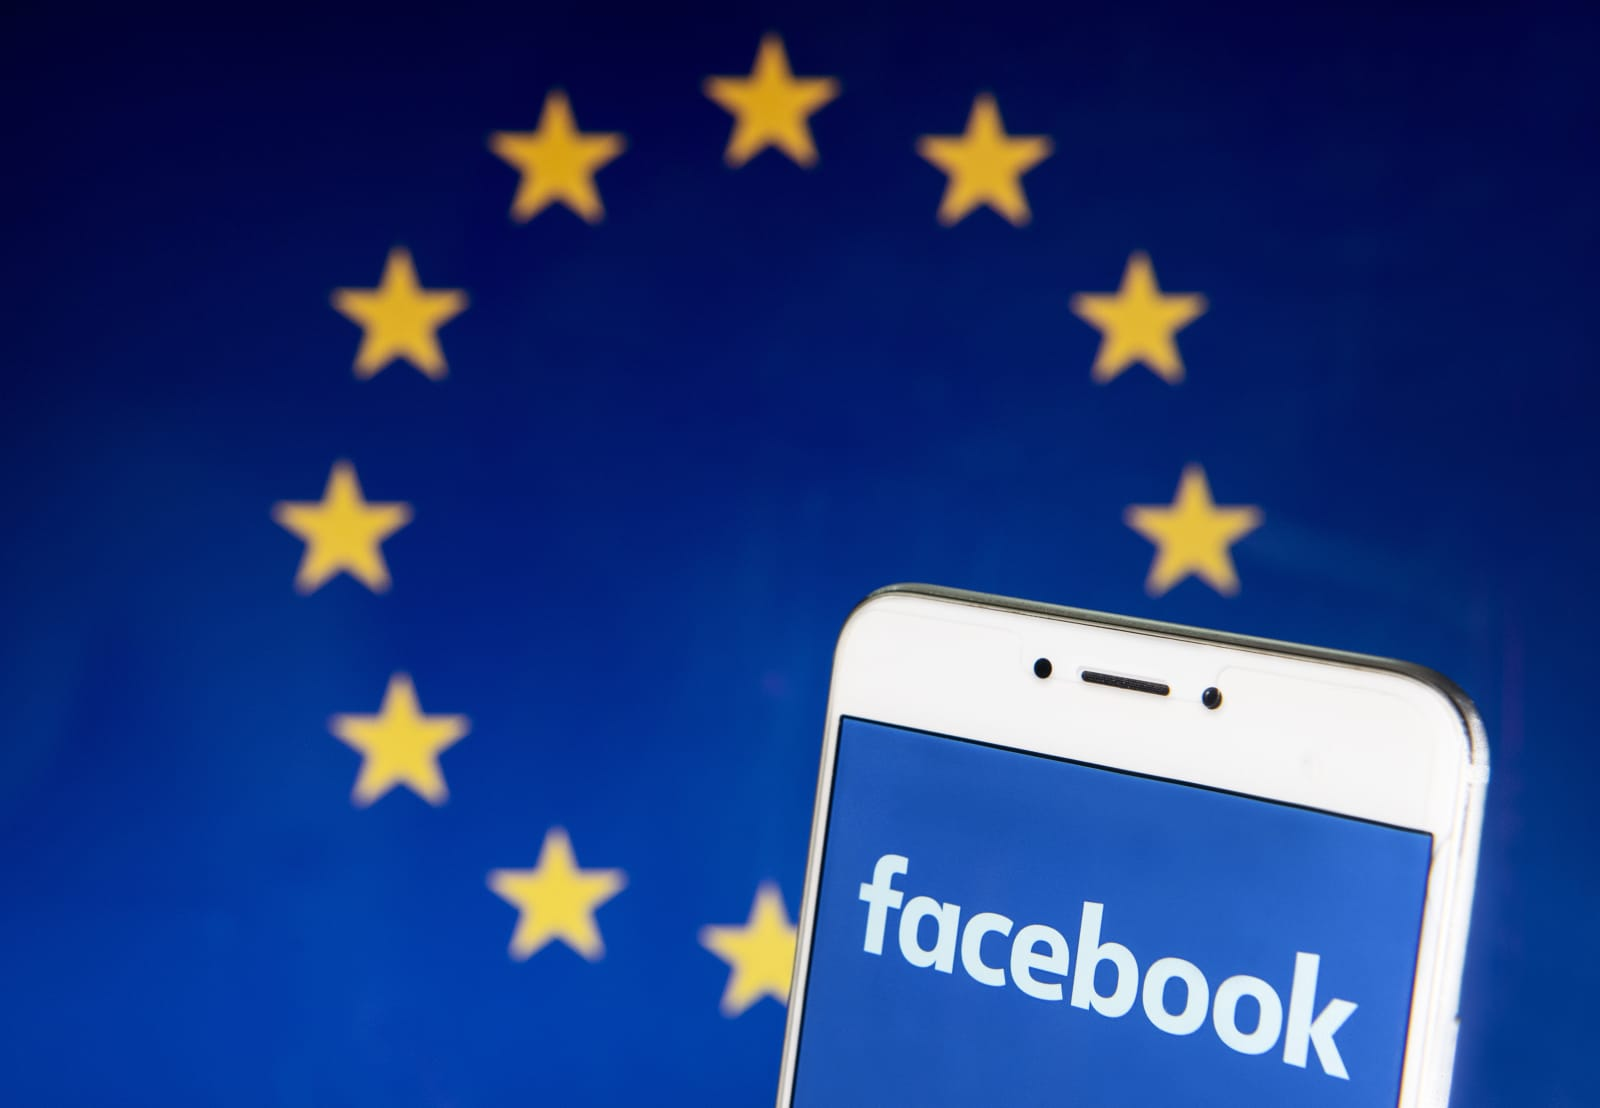 Facebook is facing an EU investigation over data collection